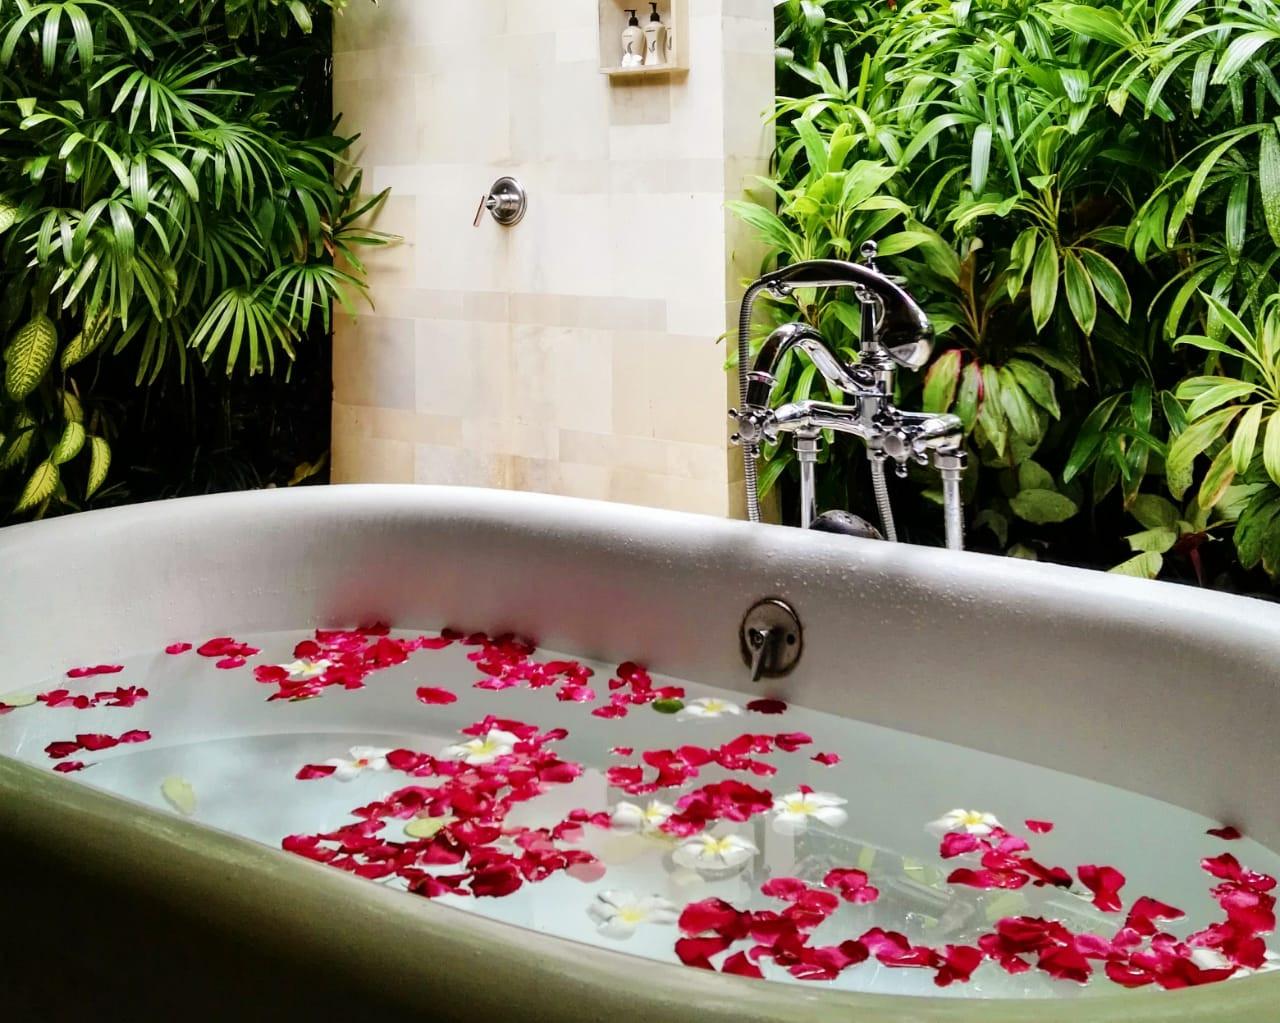 A flower bath at the Four Seasons Bali spa.